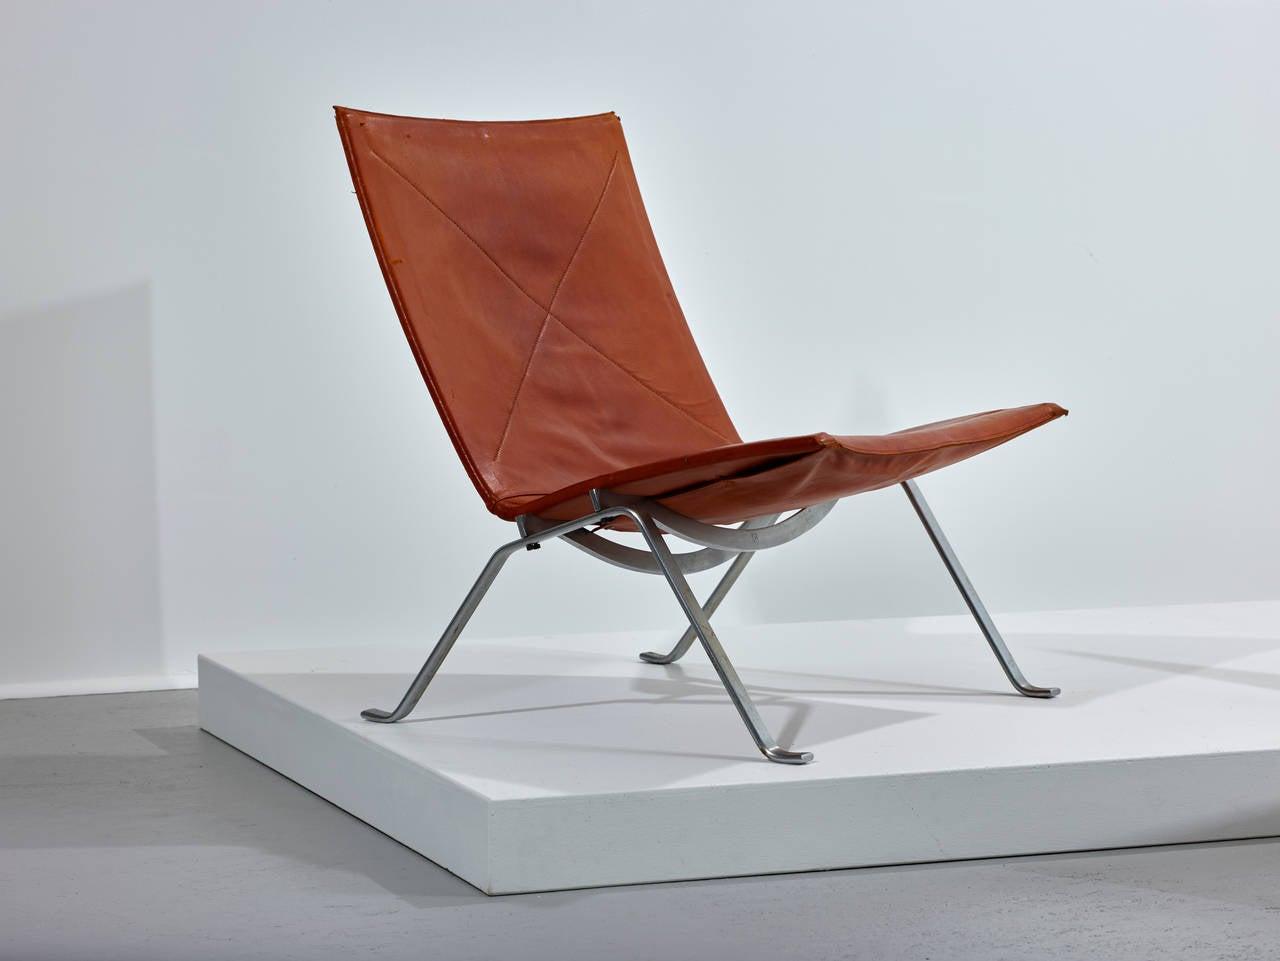 Poul Kjaerholm PK 22 Chairs for E. Kold Christensen, Original Condition 1956 4